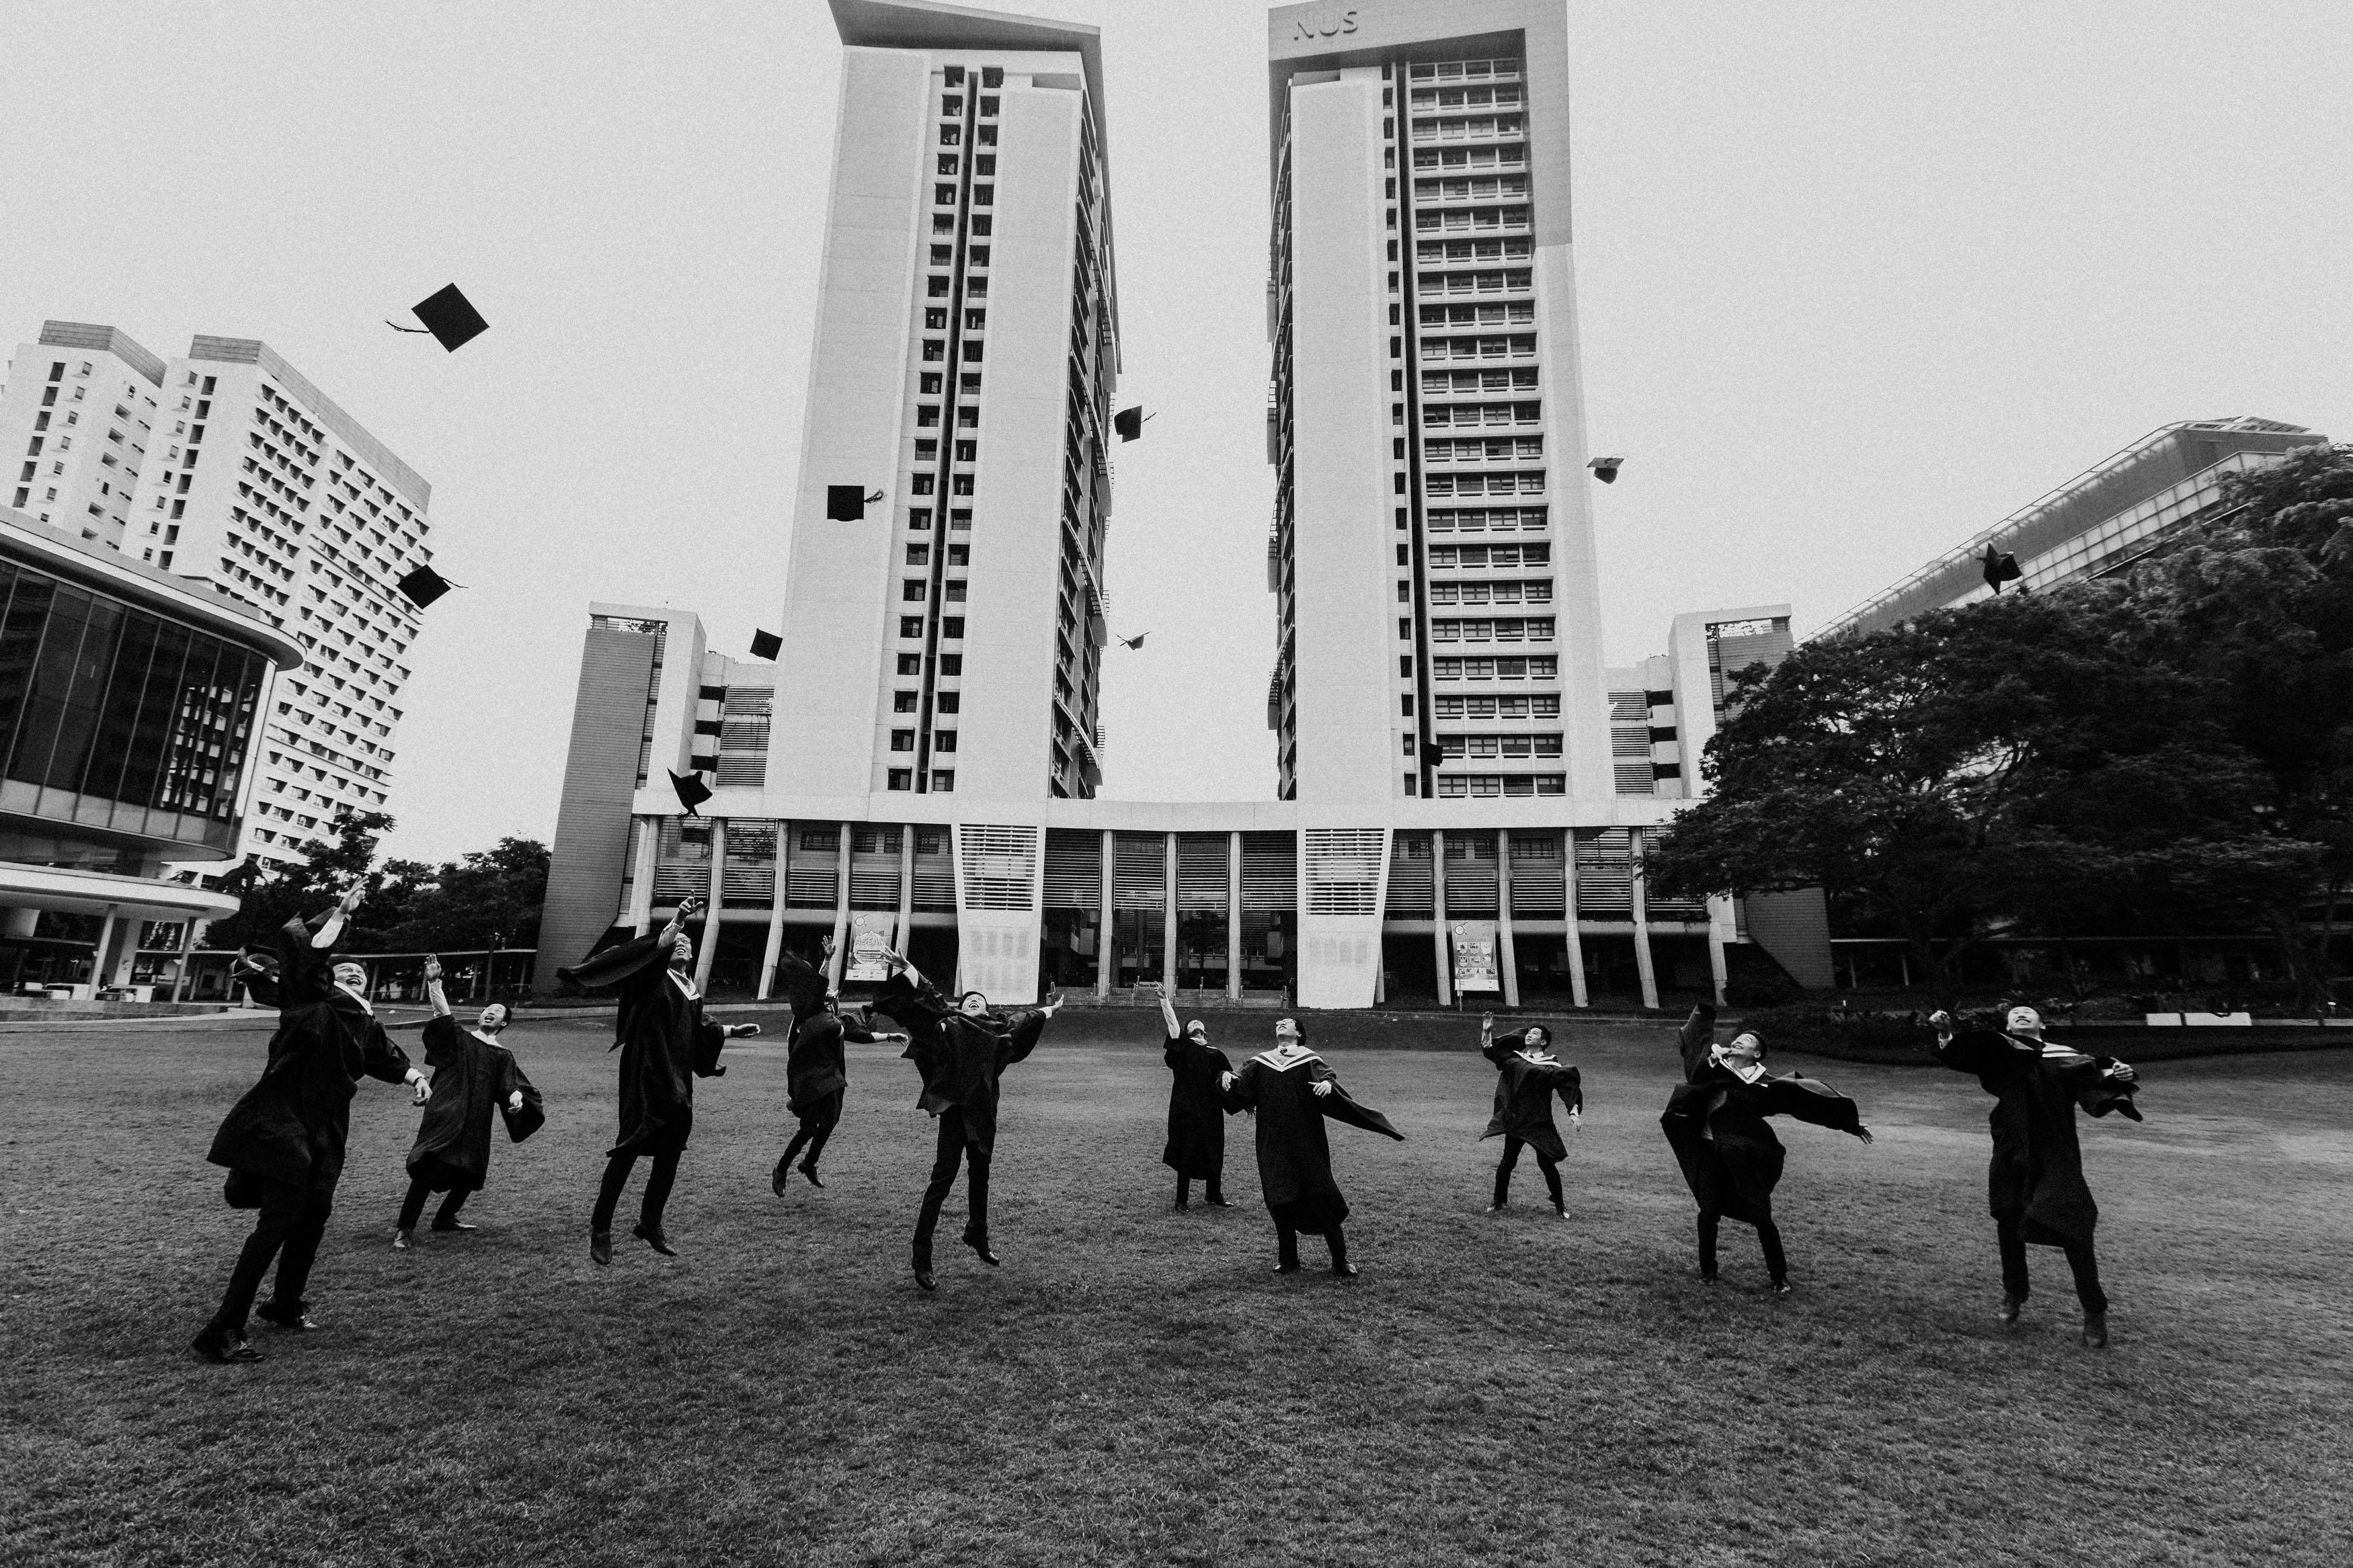 20180729-Graduation - KX & Friends -057.